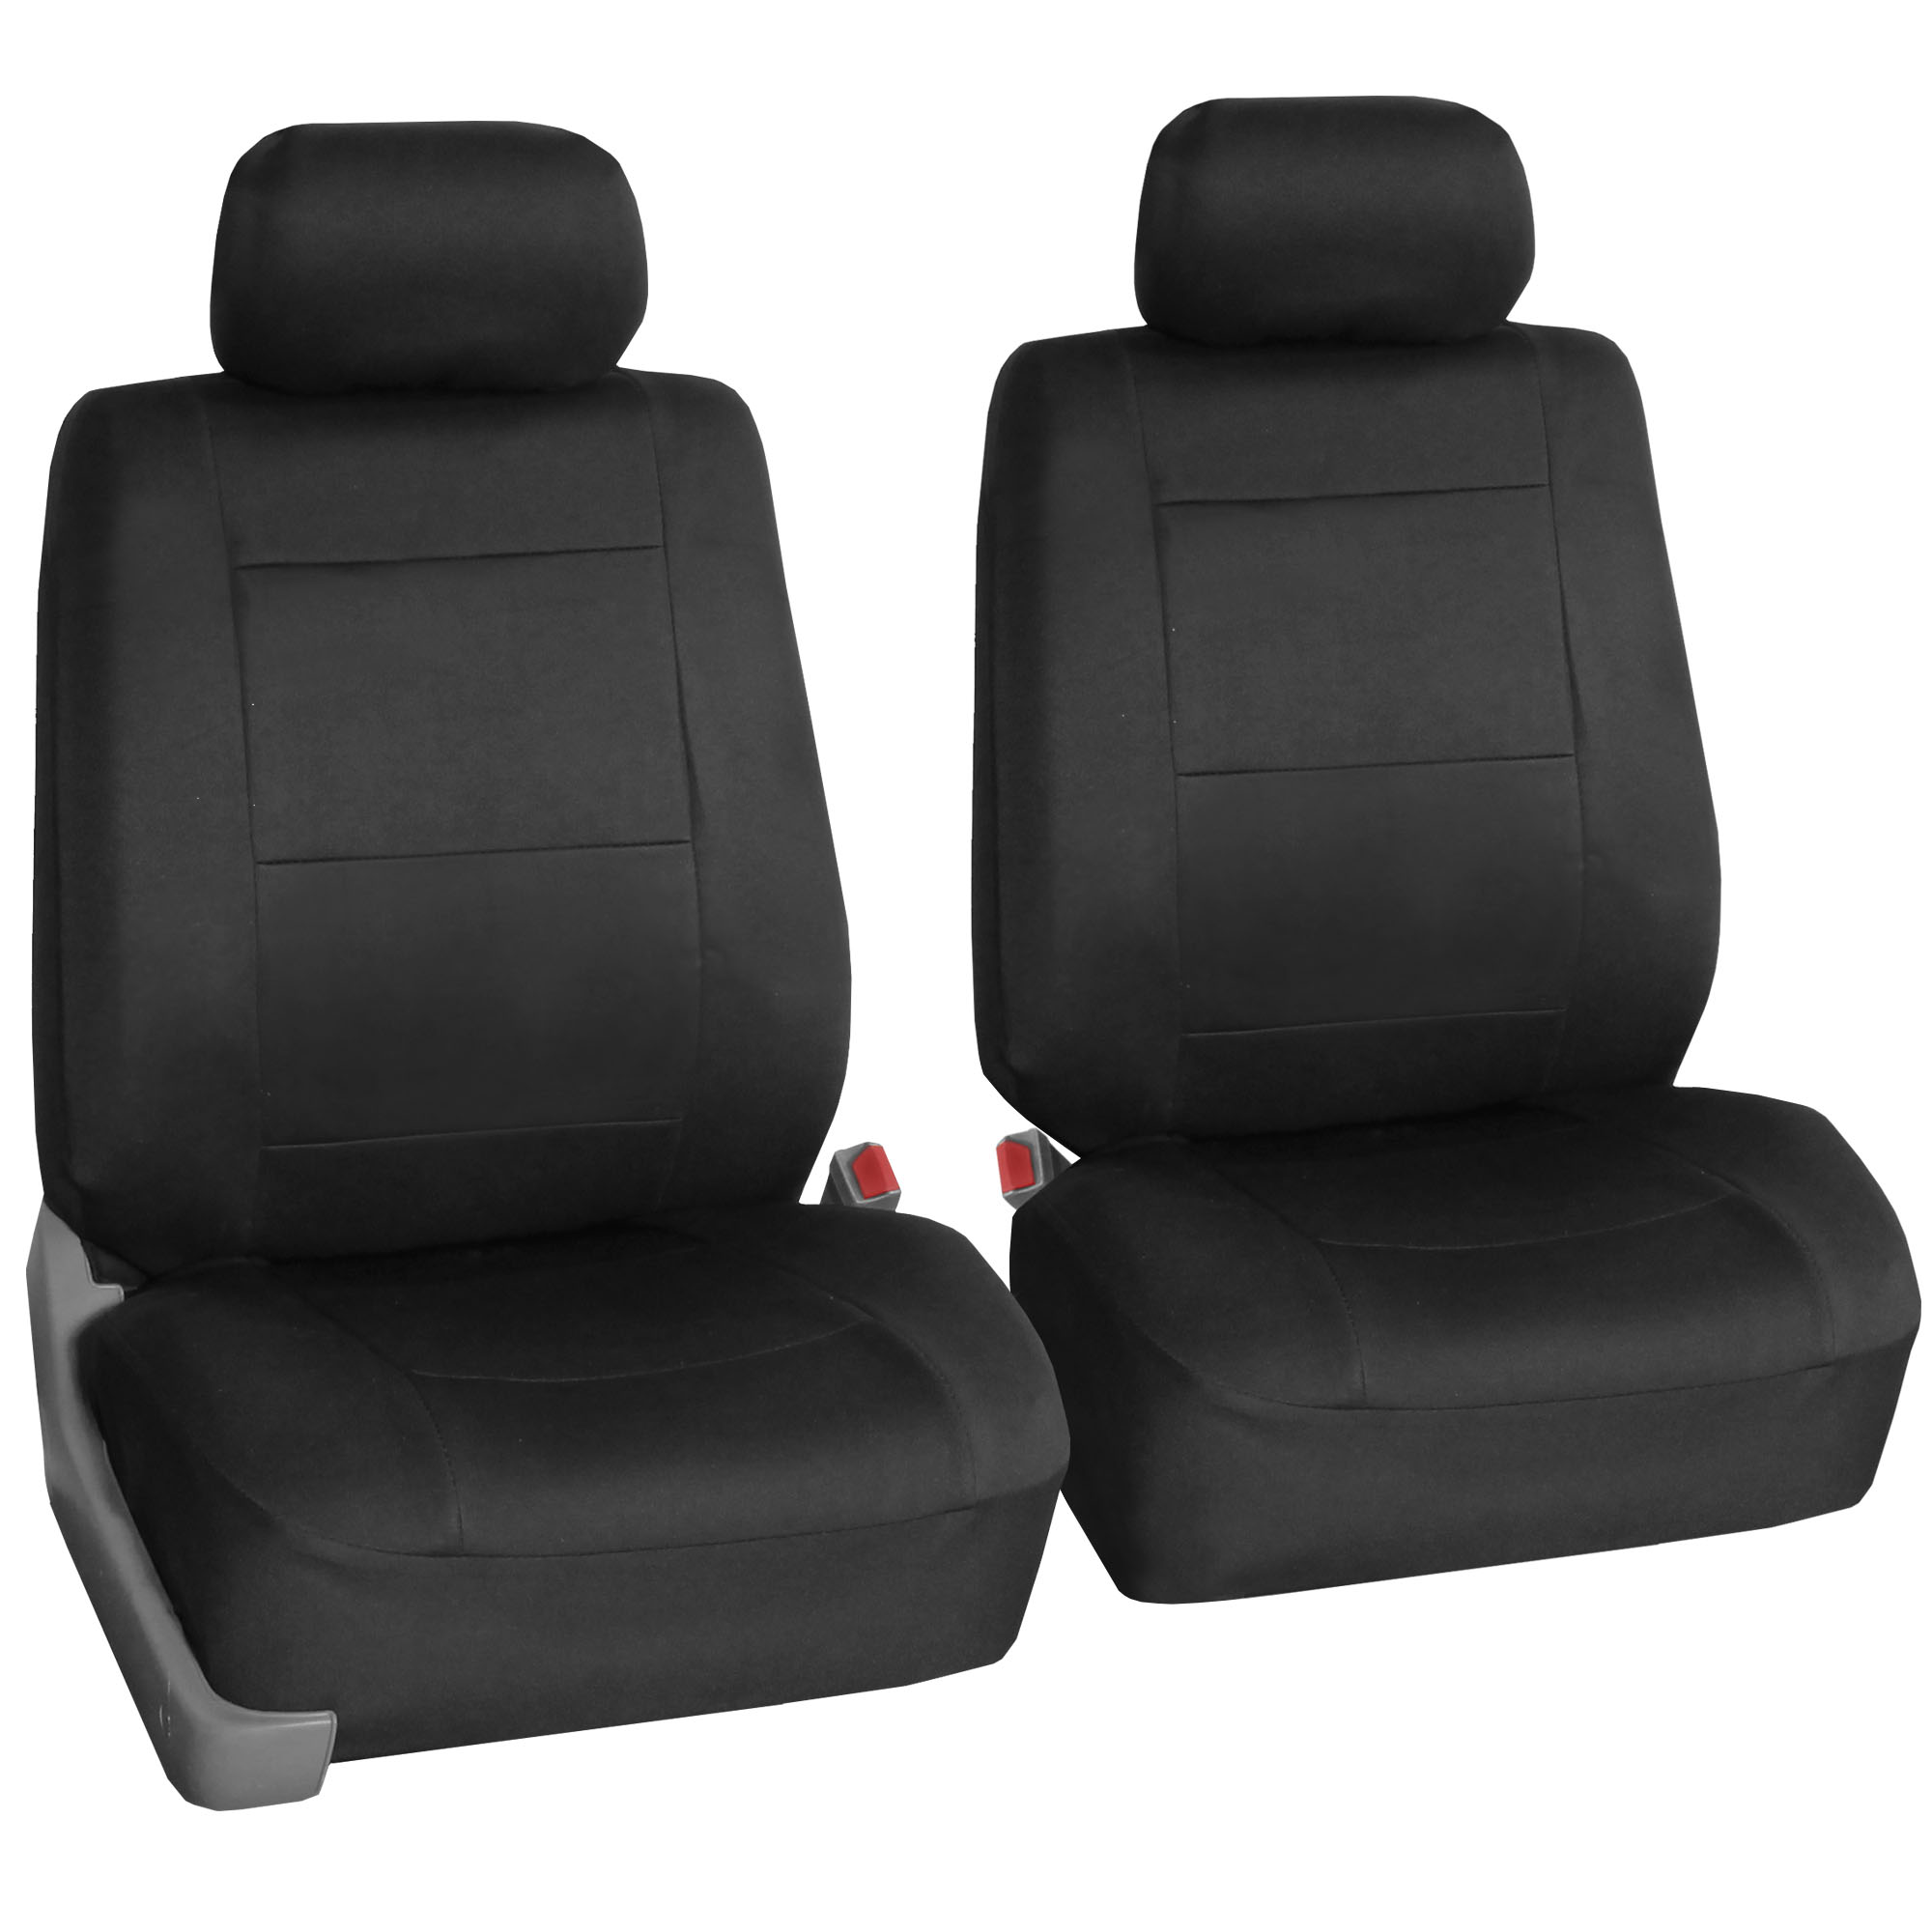 Car Seat Cover Neoprene Waterproof Pet Proof Full Set